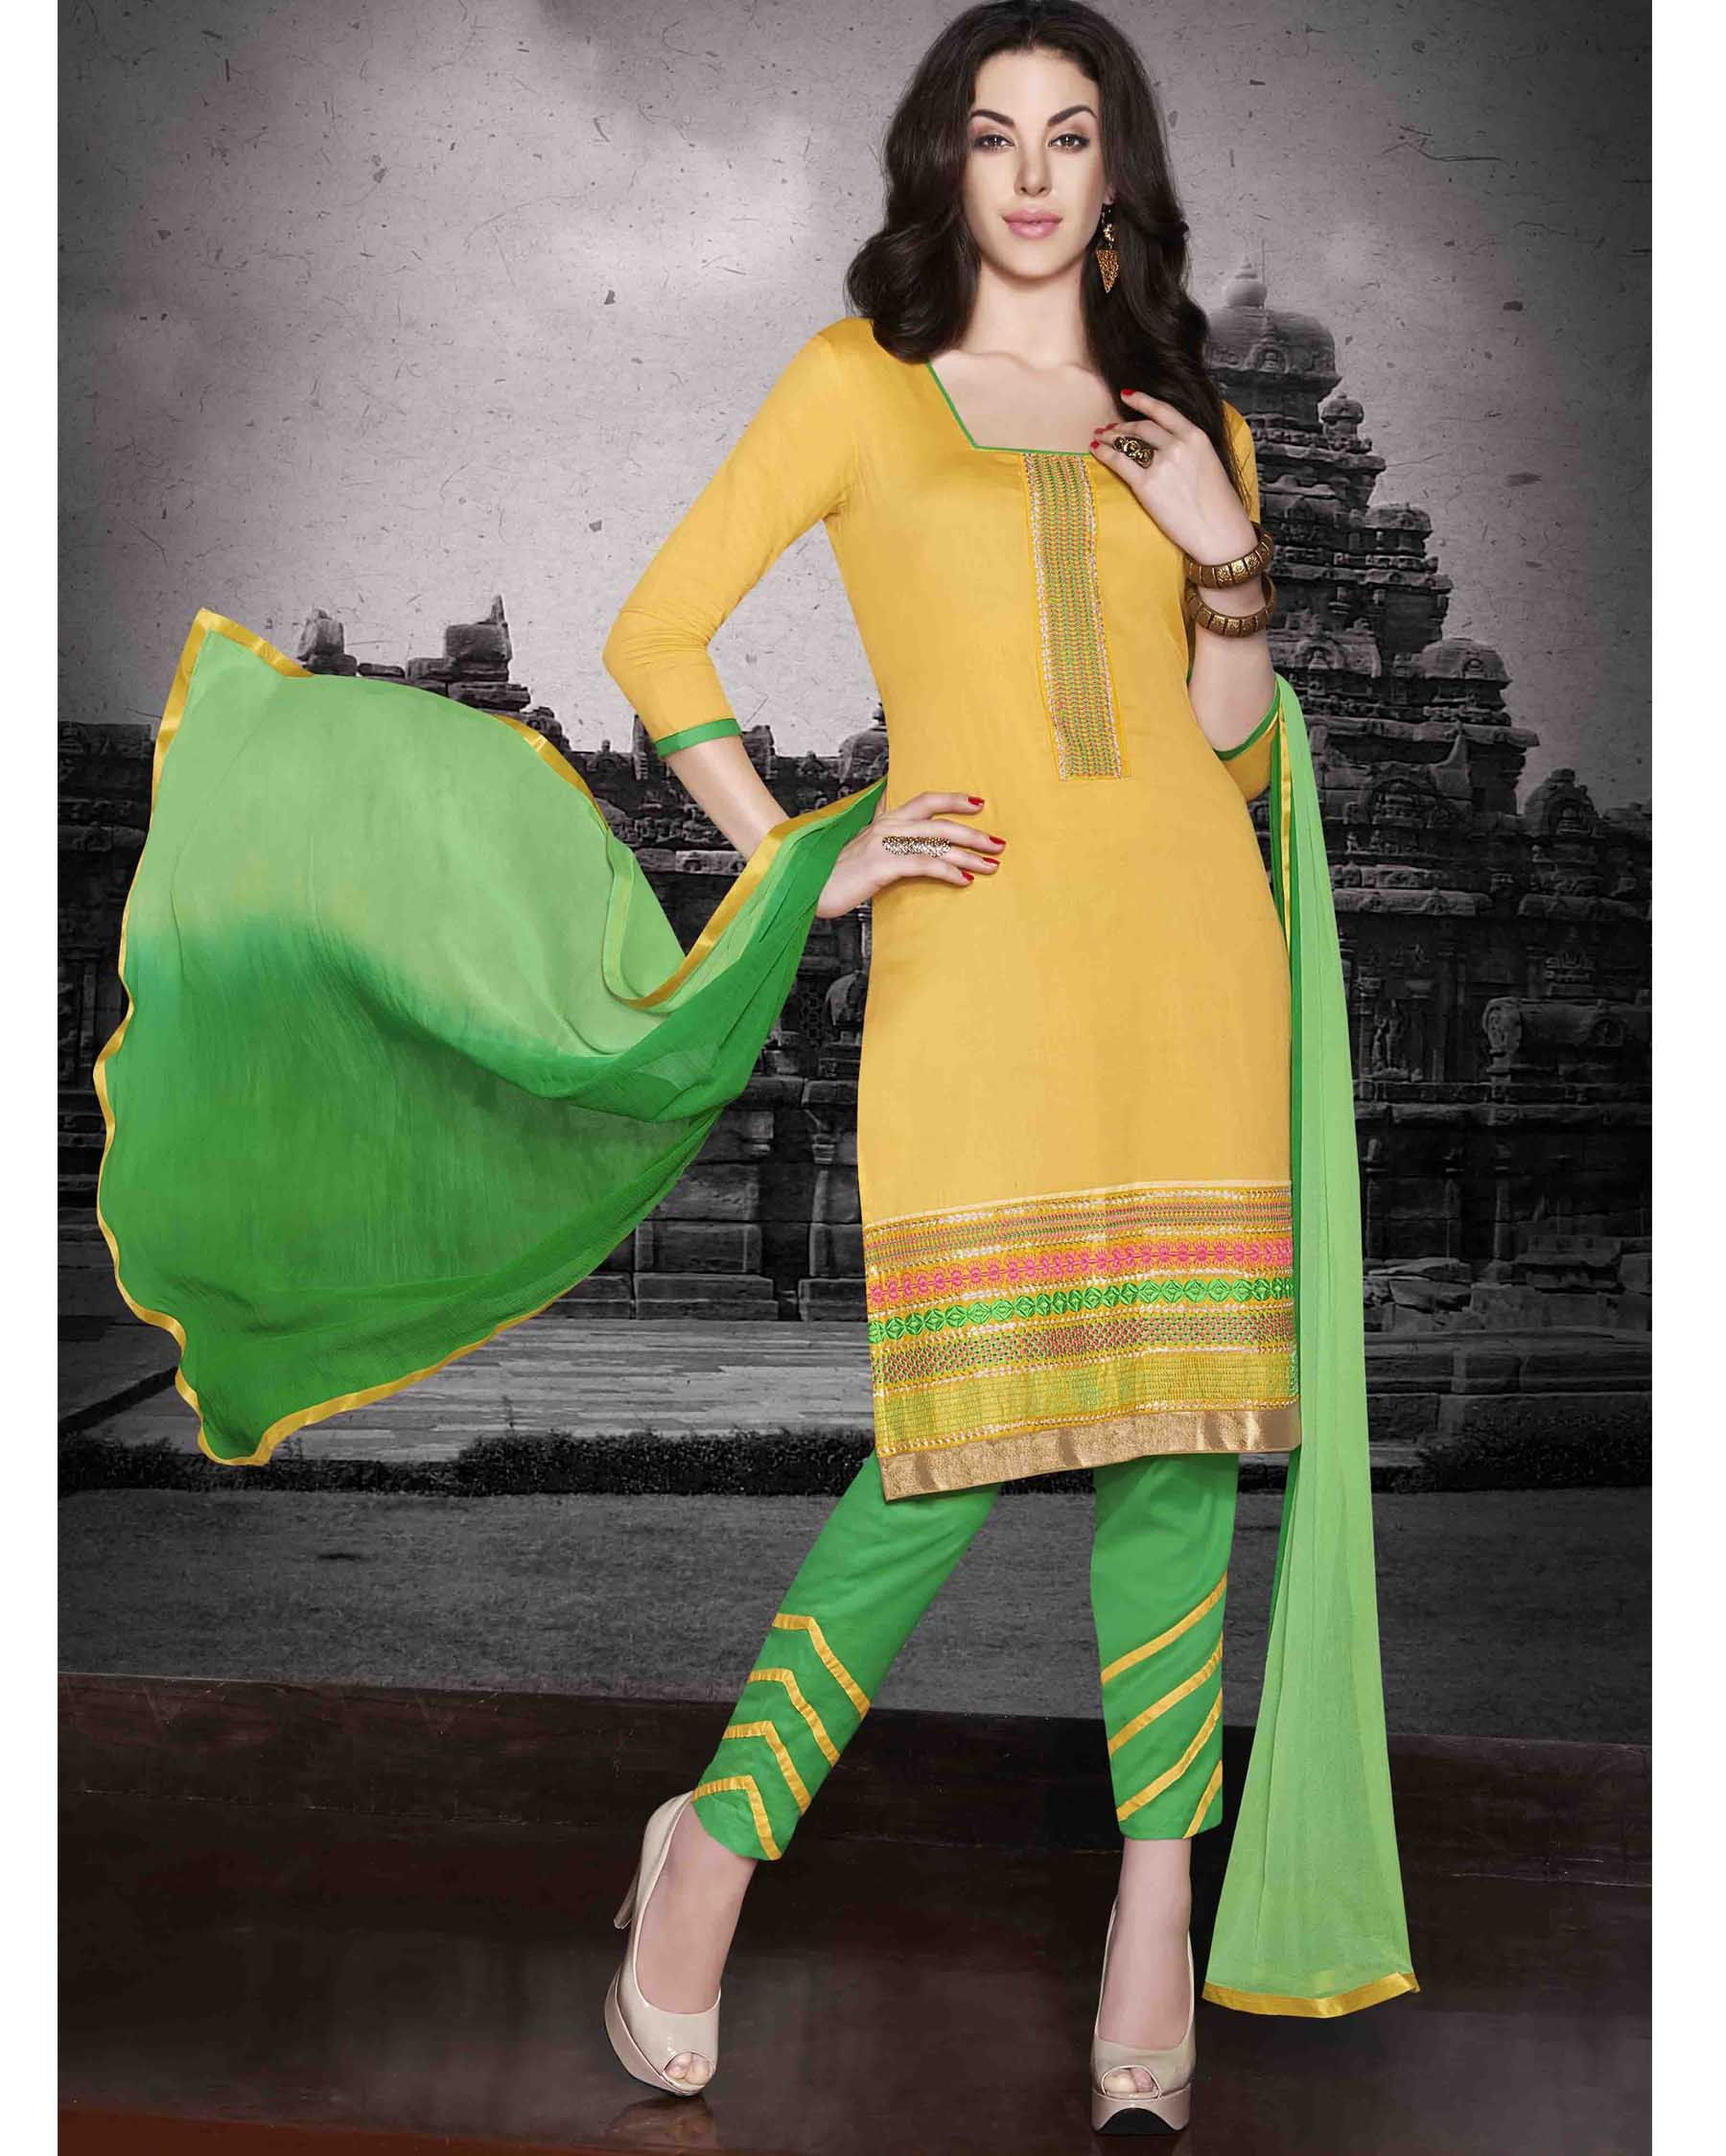 a29d0c88a8 Yellow gorgeous Embroidered Cotton Salwar Kameez (Unstitch) Fabric: Cotton  Work: Embroidered Type: Salwar Kameez (Unstitch) Color: Yellow Fabric Top  Cotton ...